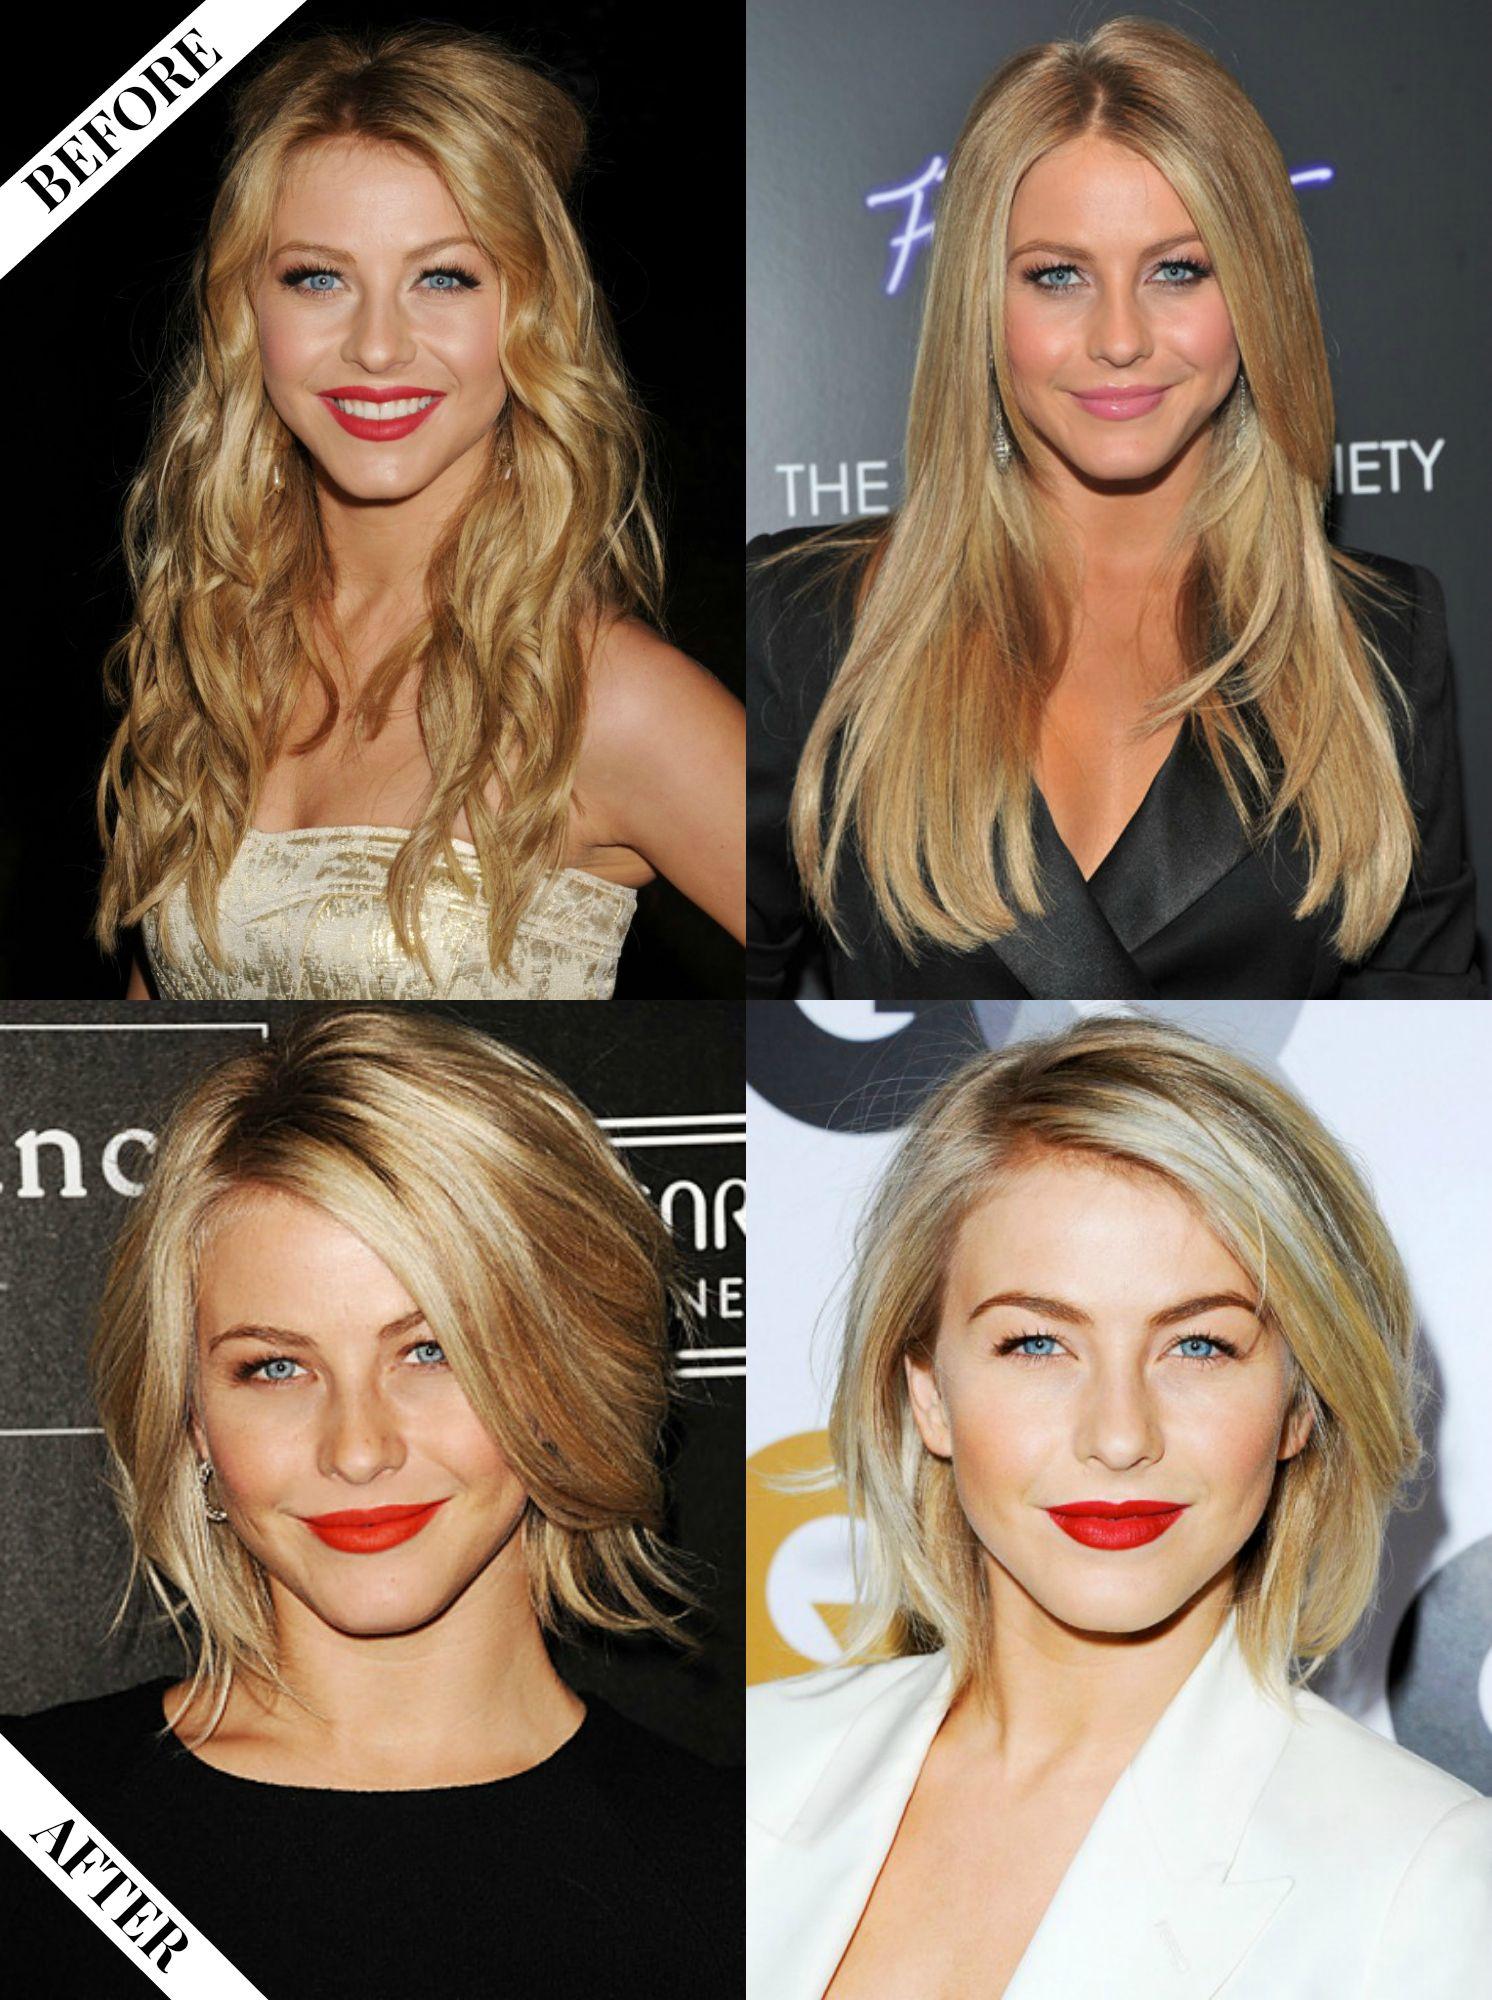 Julianne Hough Long To Short Hair Before After Haircut Long To Short Hair Short Hair Balayage Long Vs Short Hair